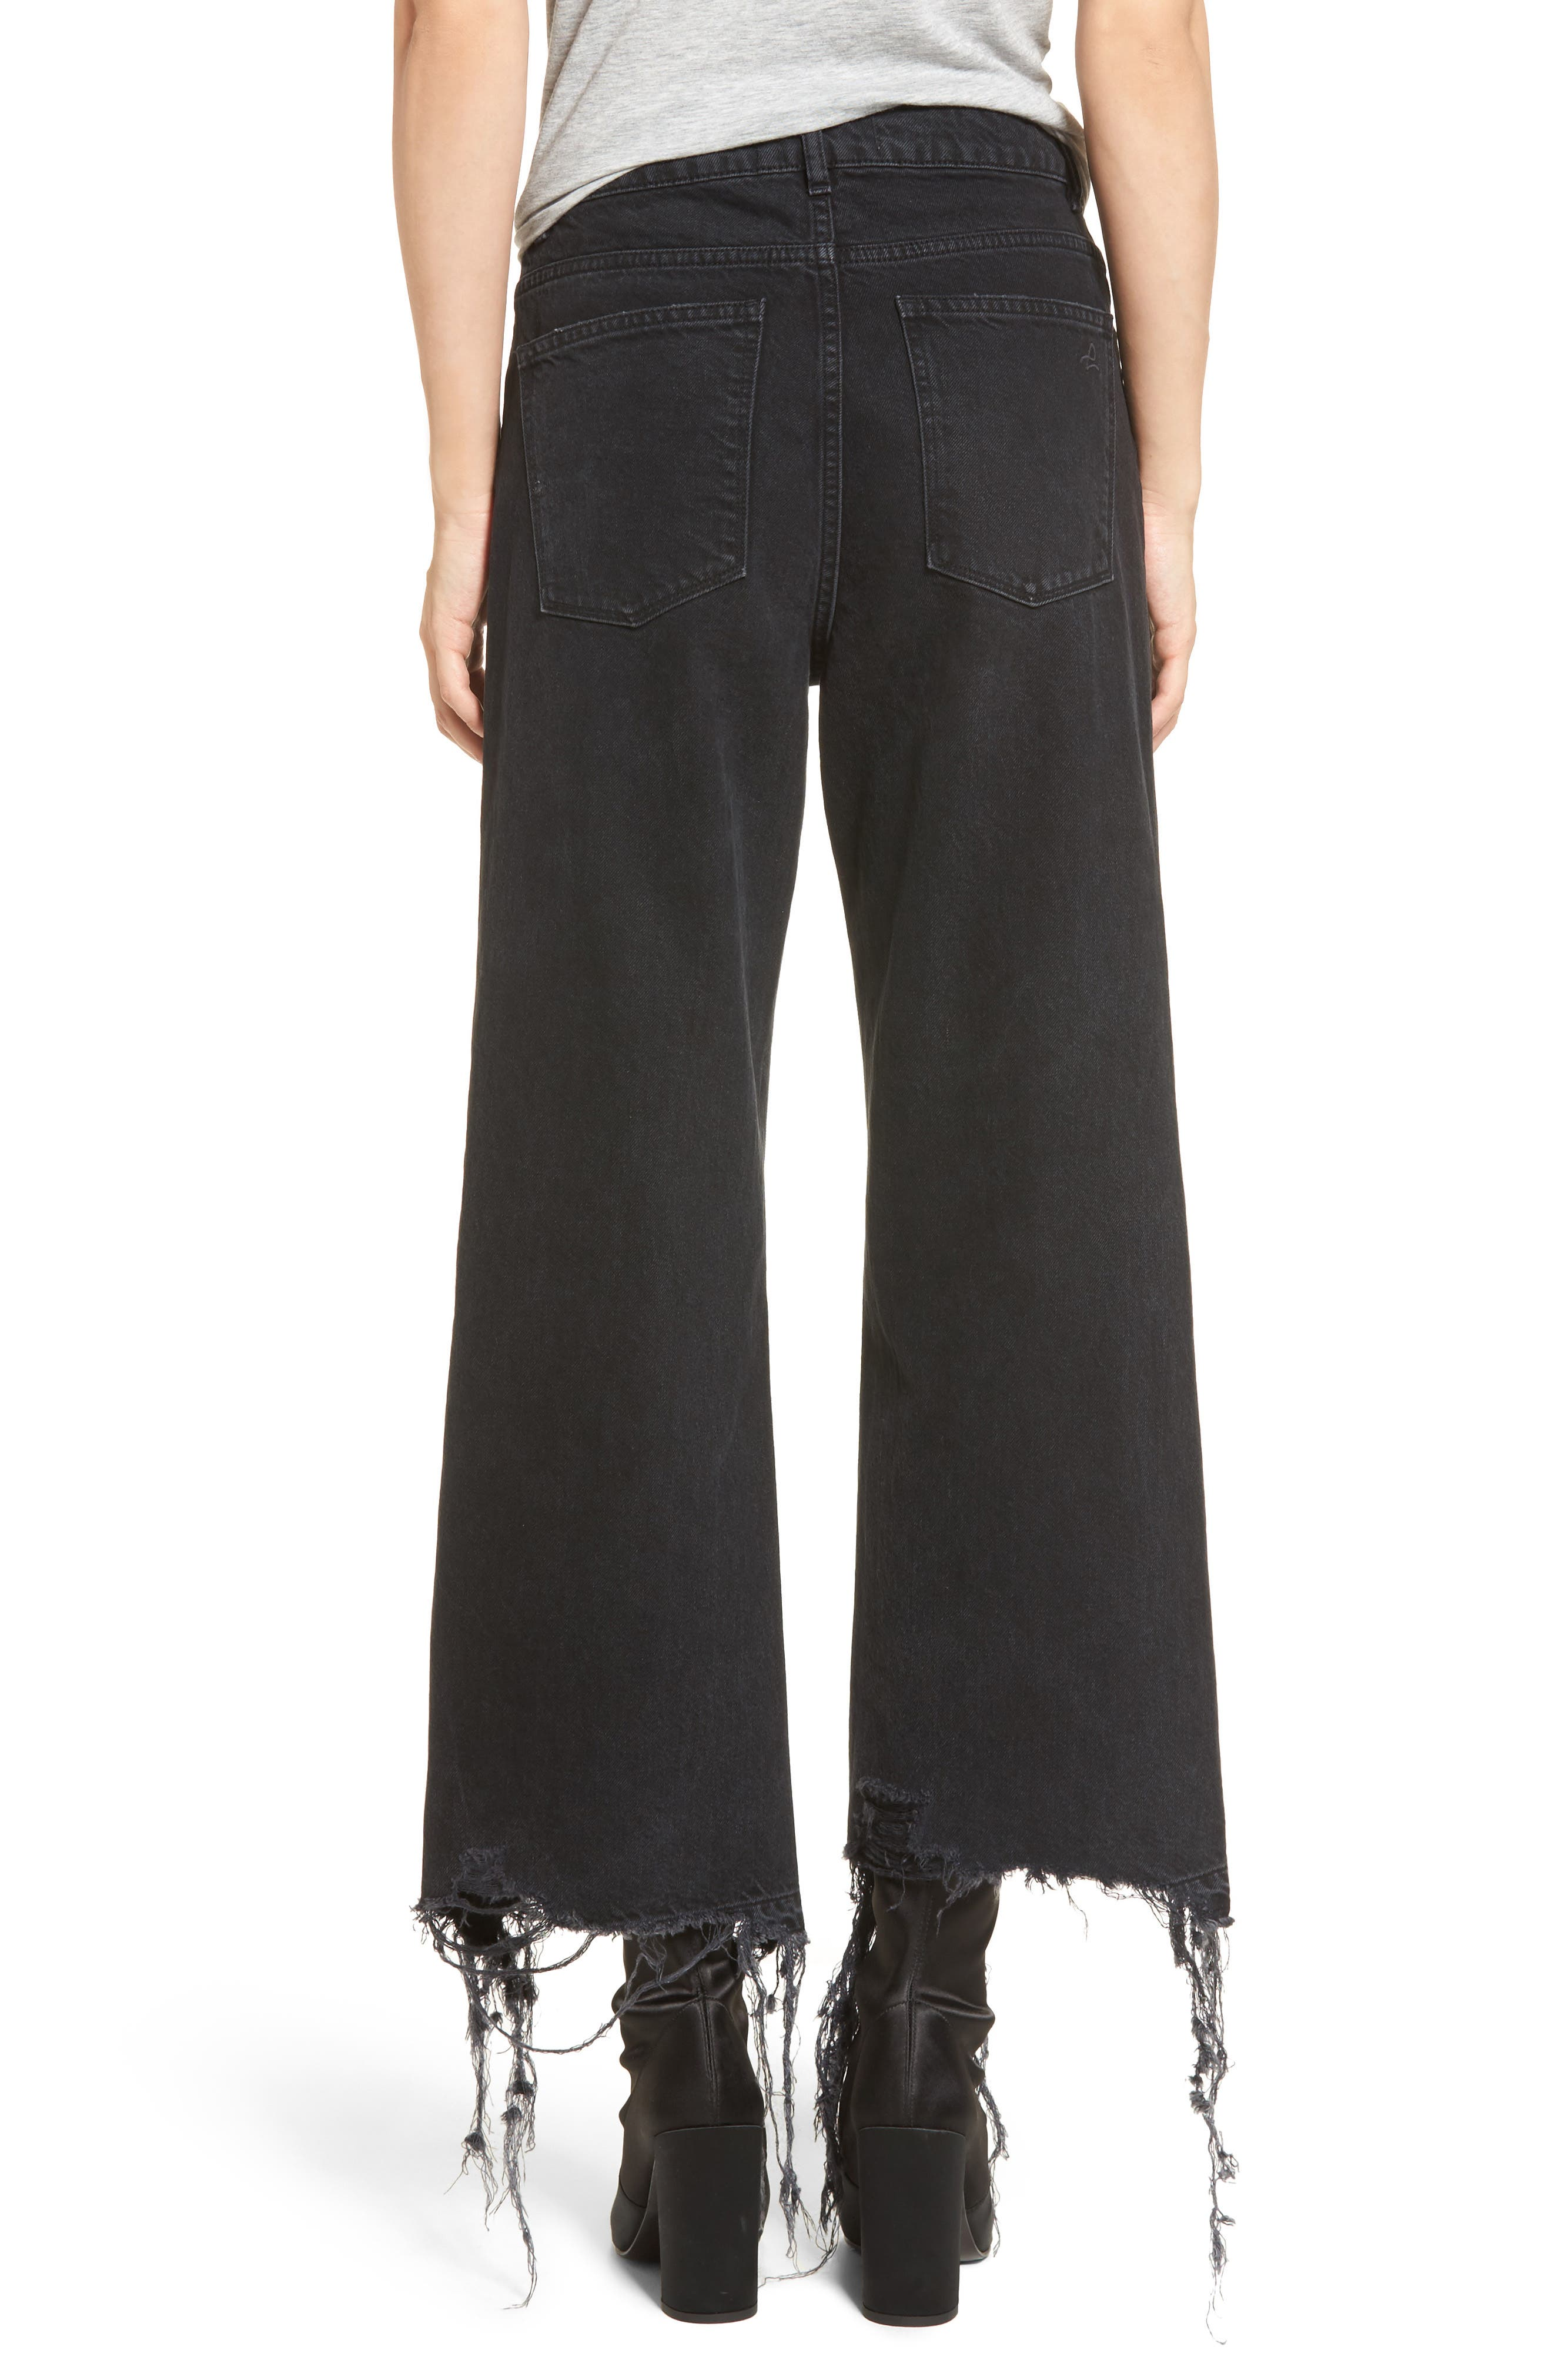 Hepburn High Waist Wide Leg Jeans,                             Alternate thumbnail 2, color,                             Savannah Destroy